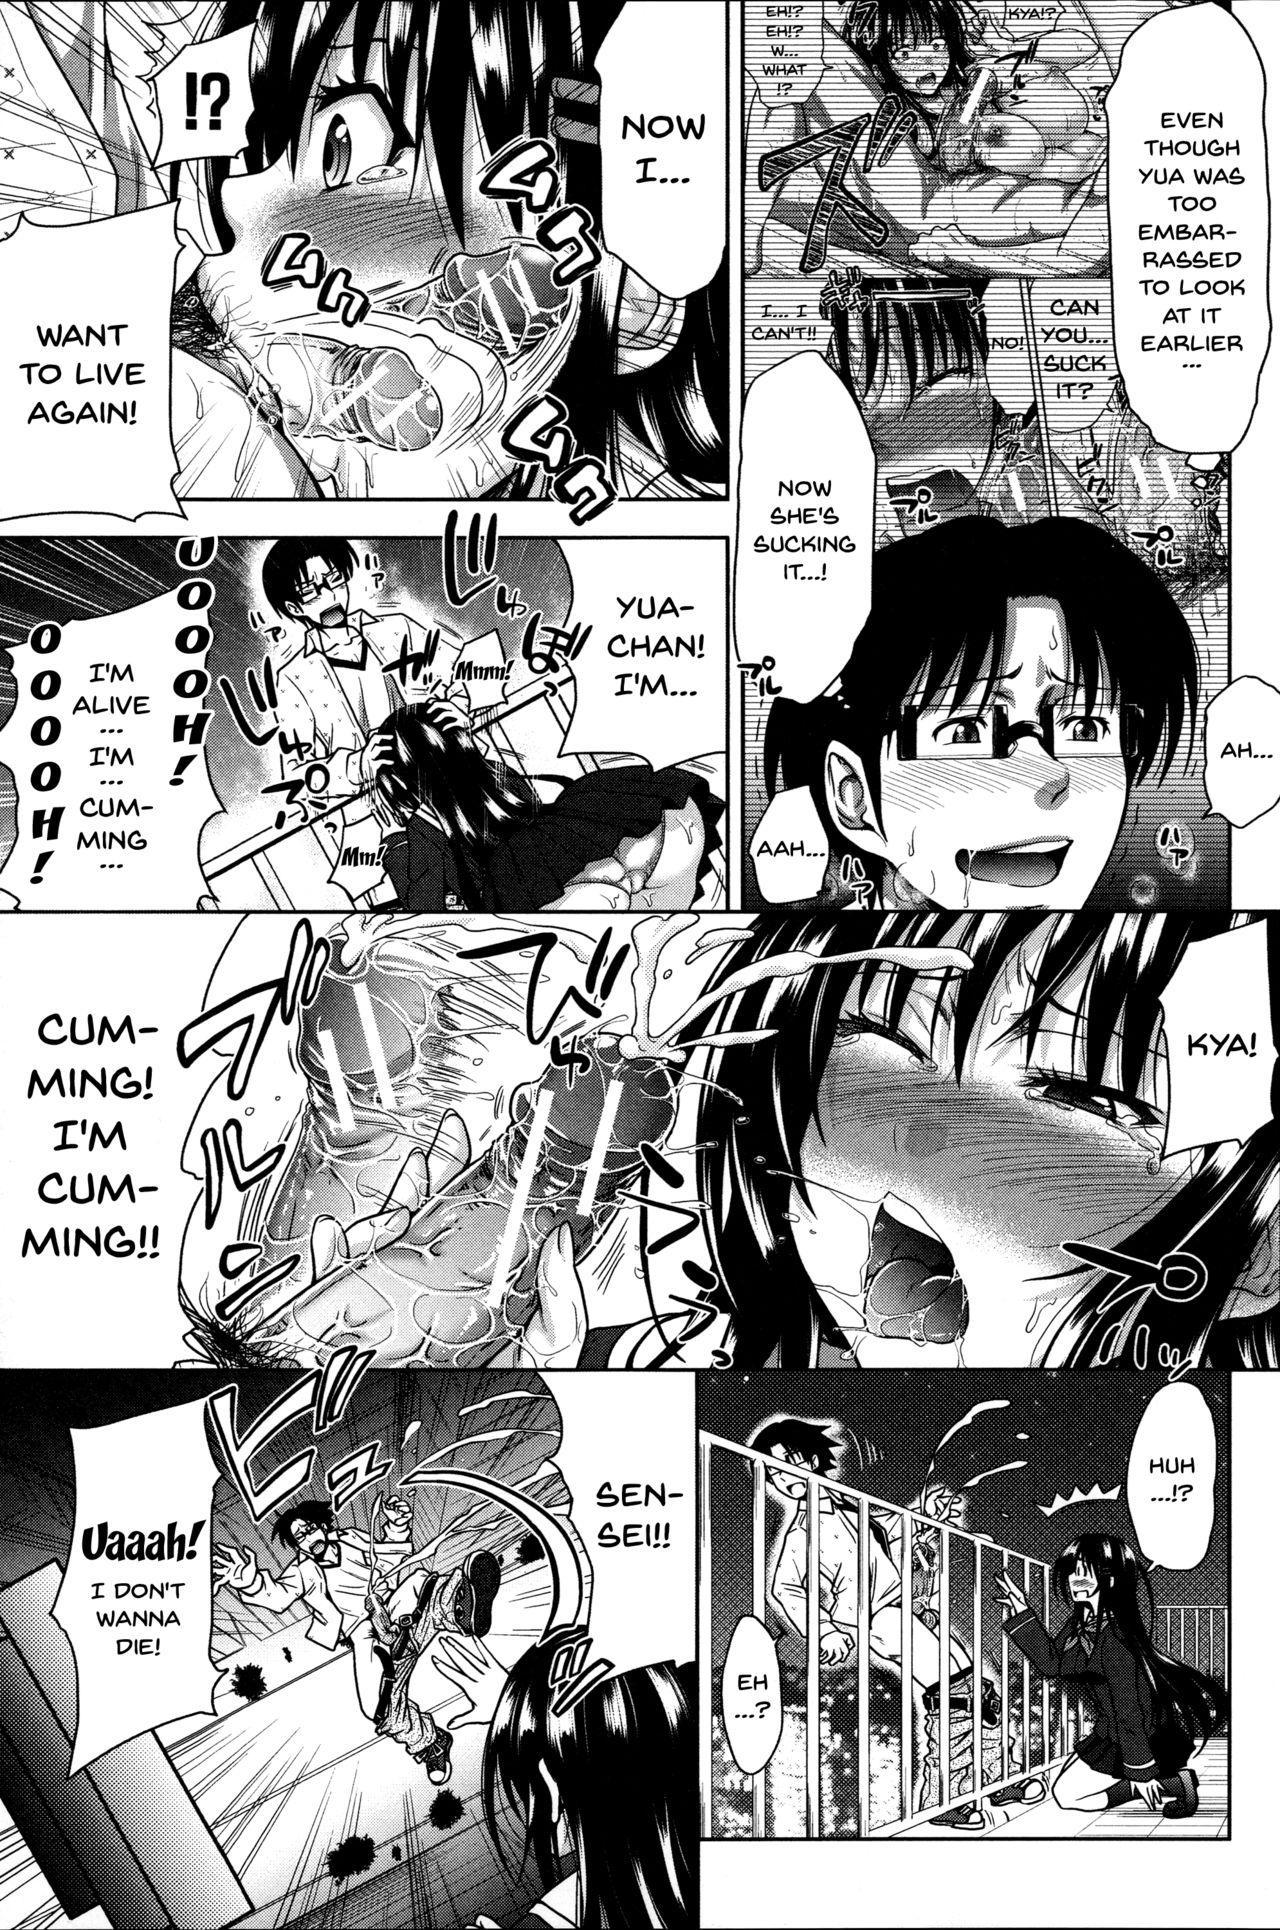 Pakotate! Seikouritsu 0% no Teppeki Bishojo VS Seikouritsu 100% no Hentai Katei Kyoushi   Pakotate! Sex Rate 0% Iron-Willed Beautiful Virgins VS Sex Rate 100% Perverted Coach 168